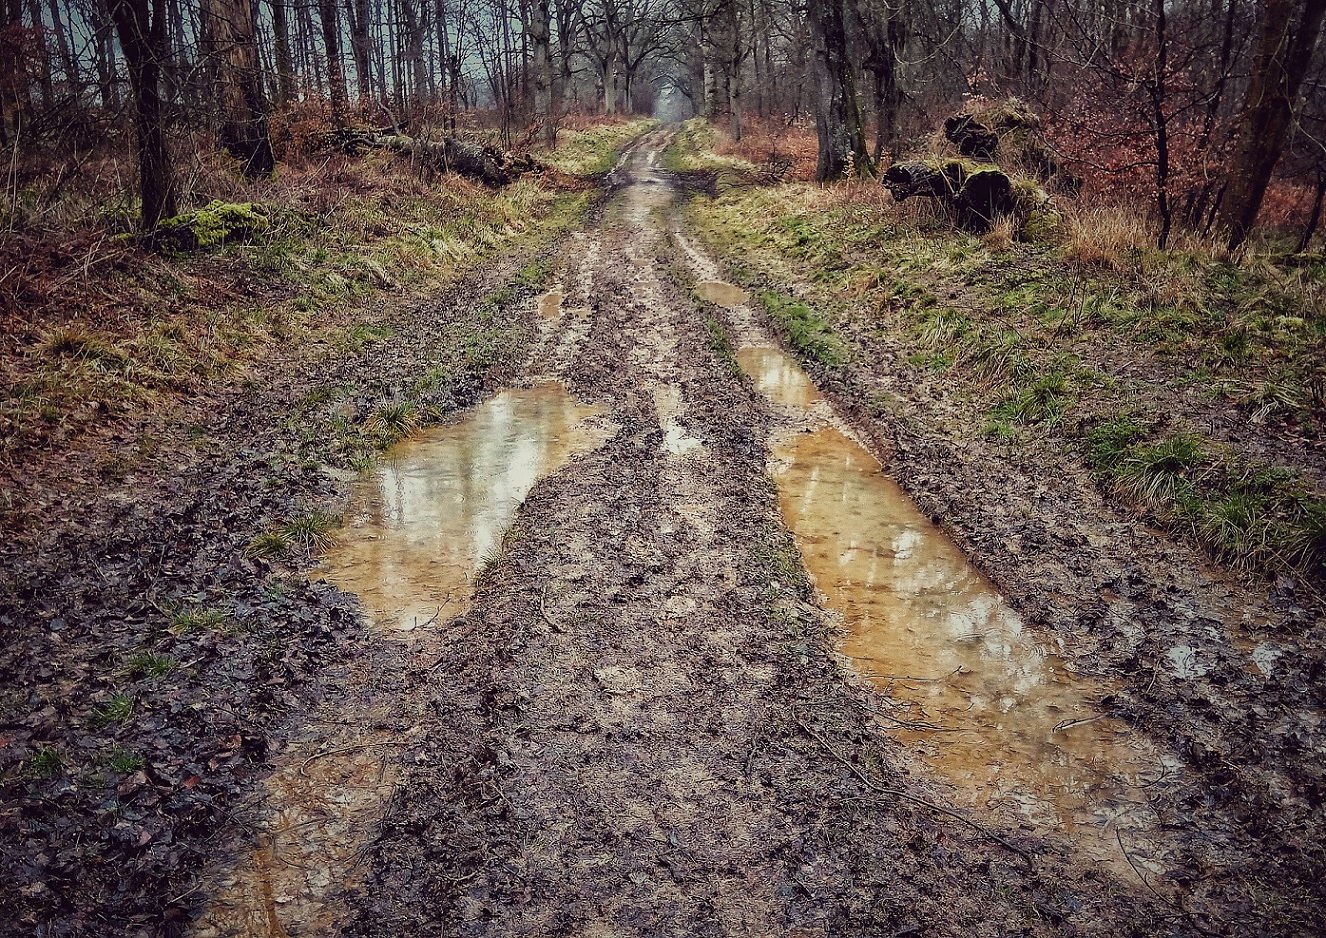 Wandern via @@henwickcharlie | Land Rover Explore